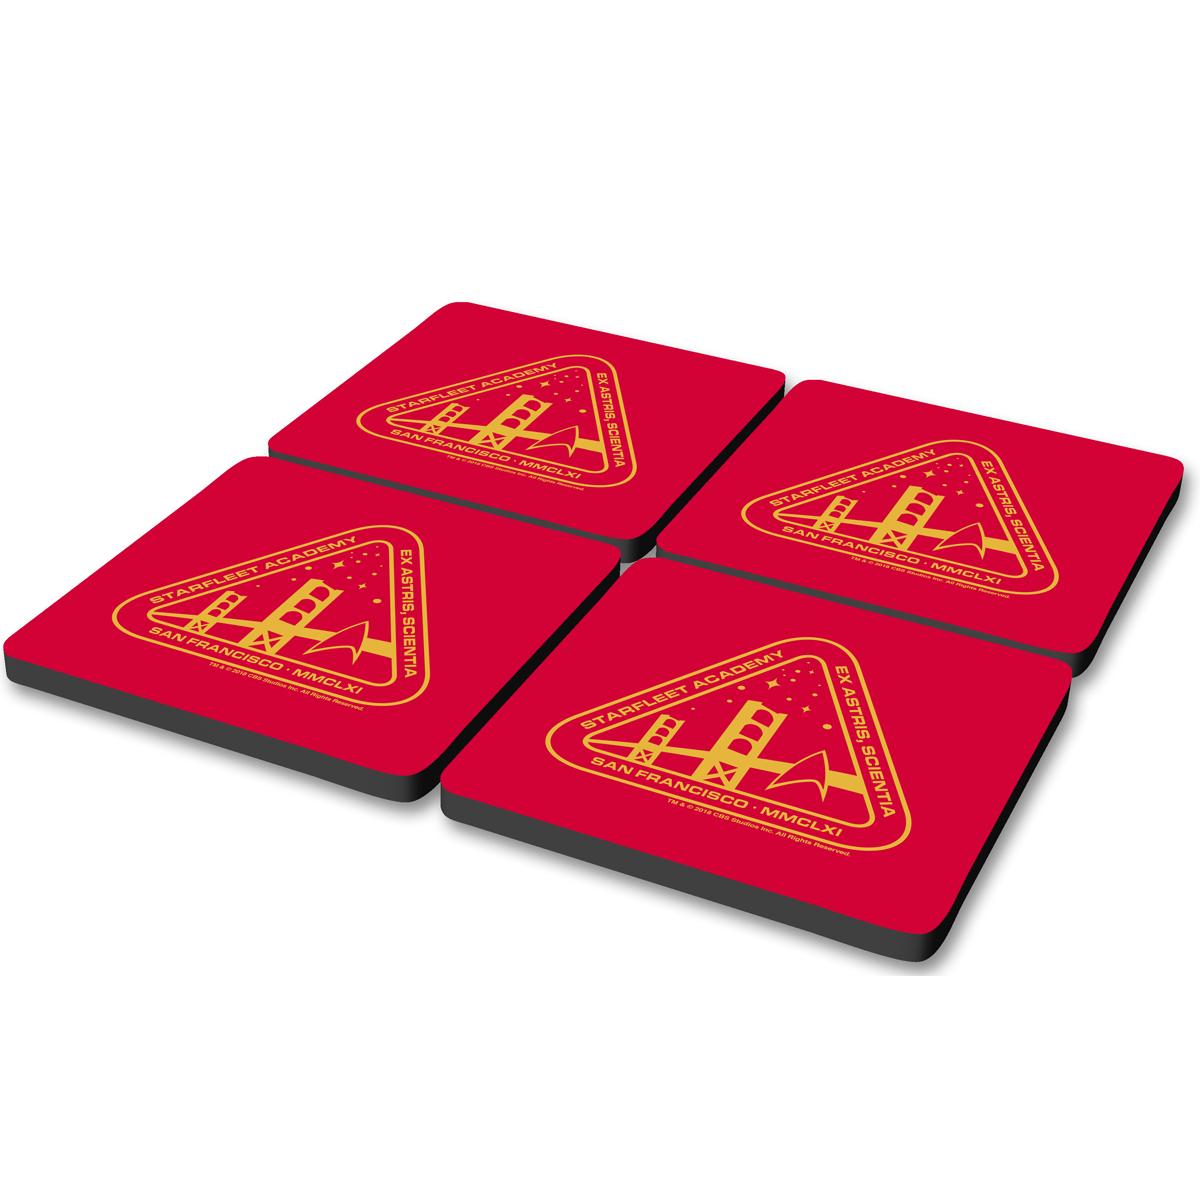 Star Trek Starfleet Academy Logo Coasters (Set of 4)